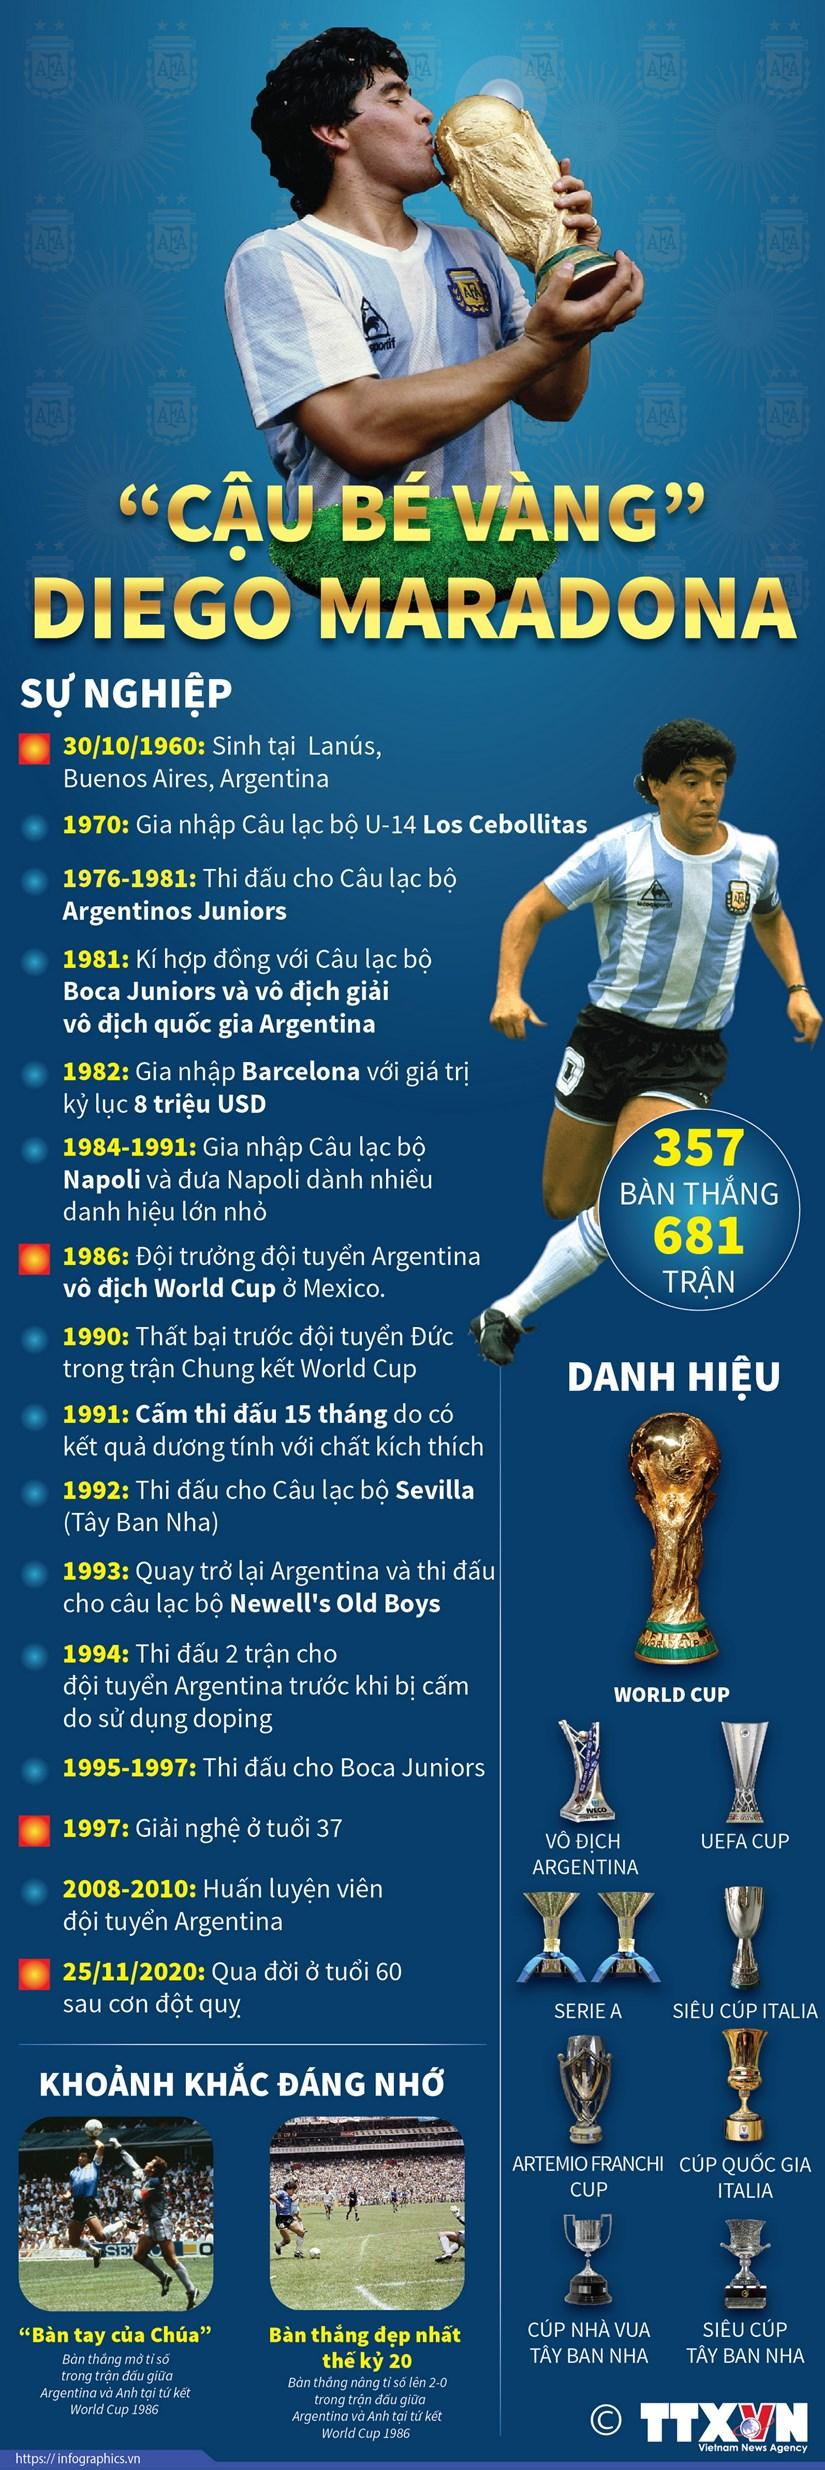 [Infographics] Nhung dau moc dang nho trong su nghiep cua Maradona hinh anh 1